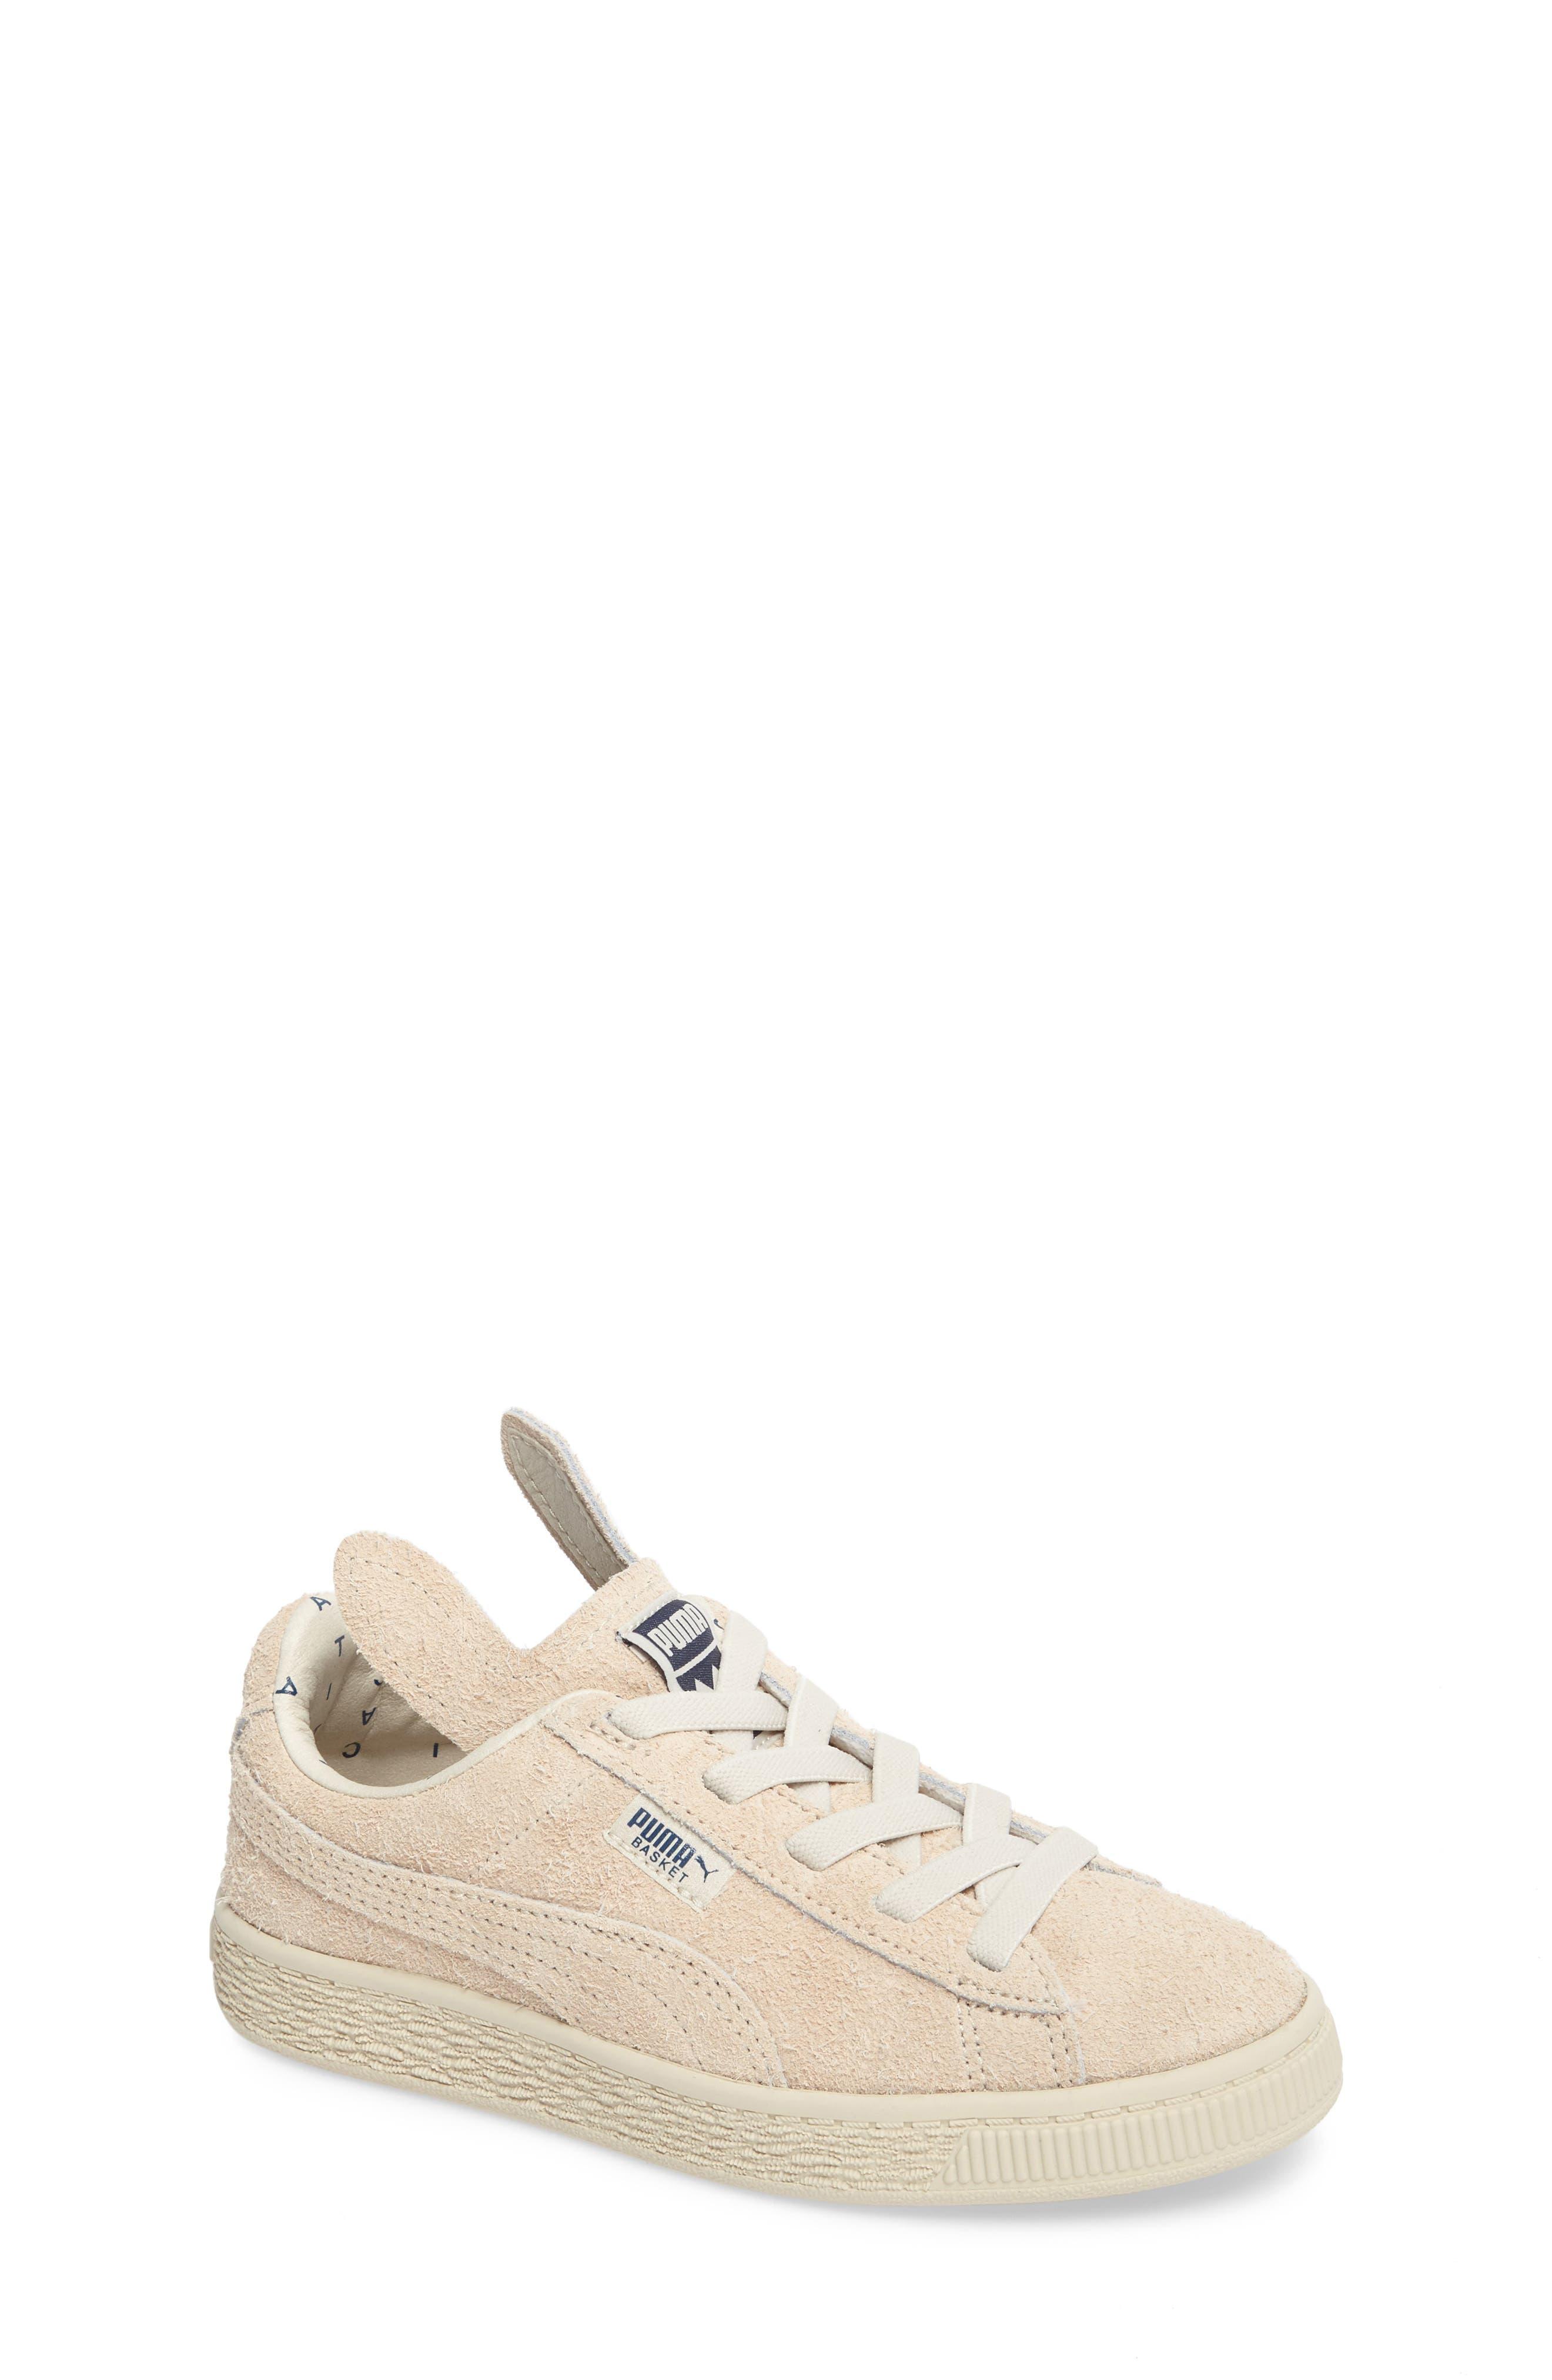 x tinycottons Basket Furry Sneaker,                             Main thumbnail 1, color,                             Birch/ Dress Blues